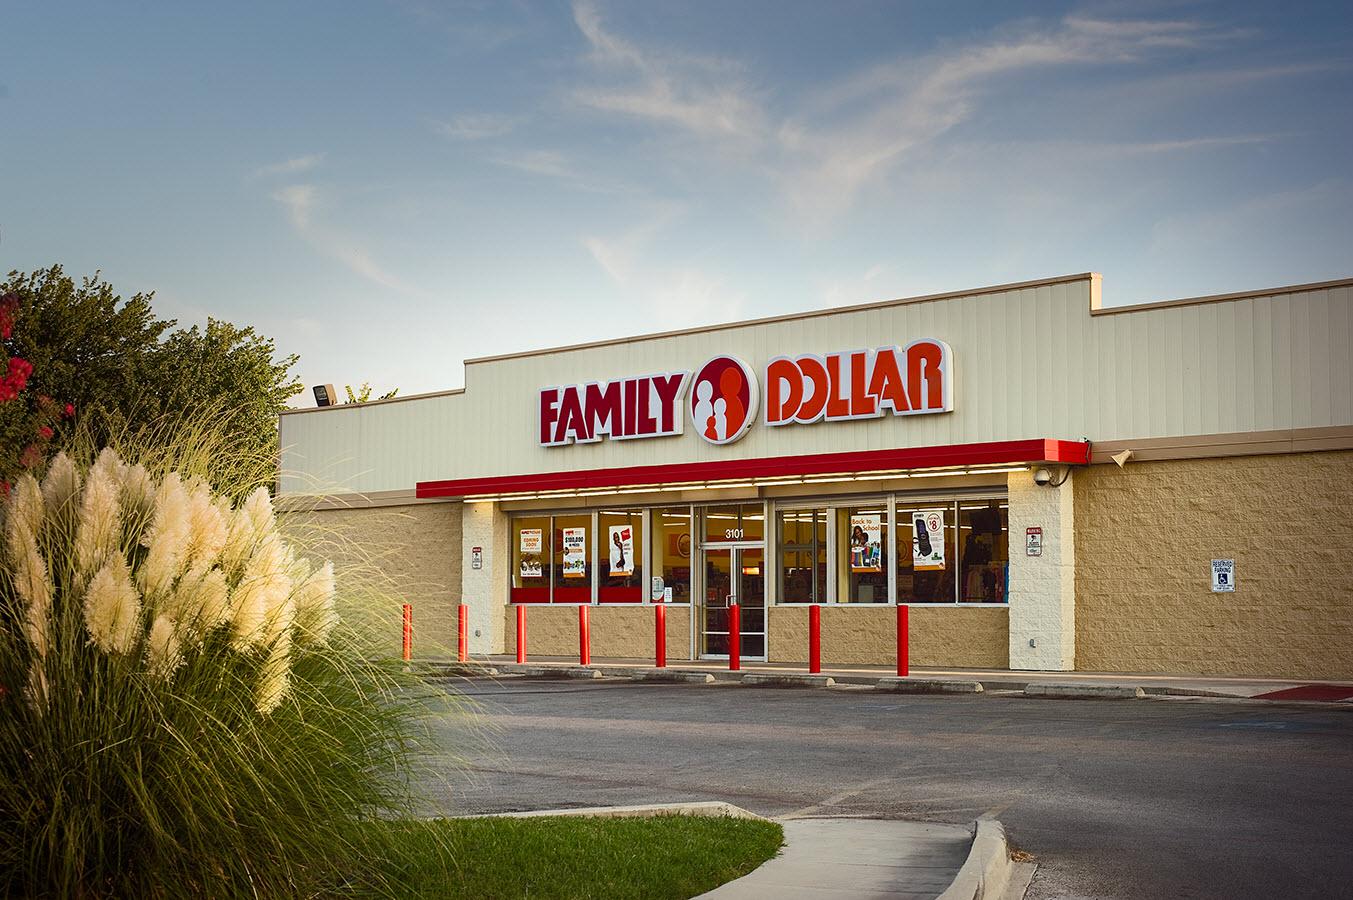 Family Dollar 1703 Highway 412 W Siloam Springs Ar 72761 Yp